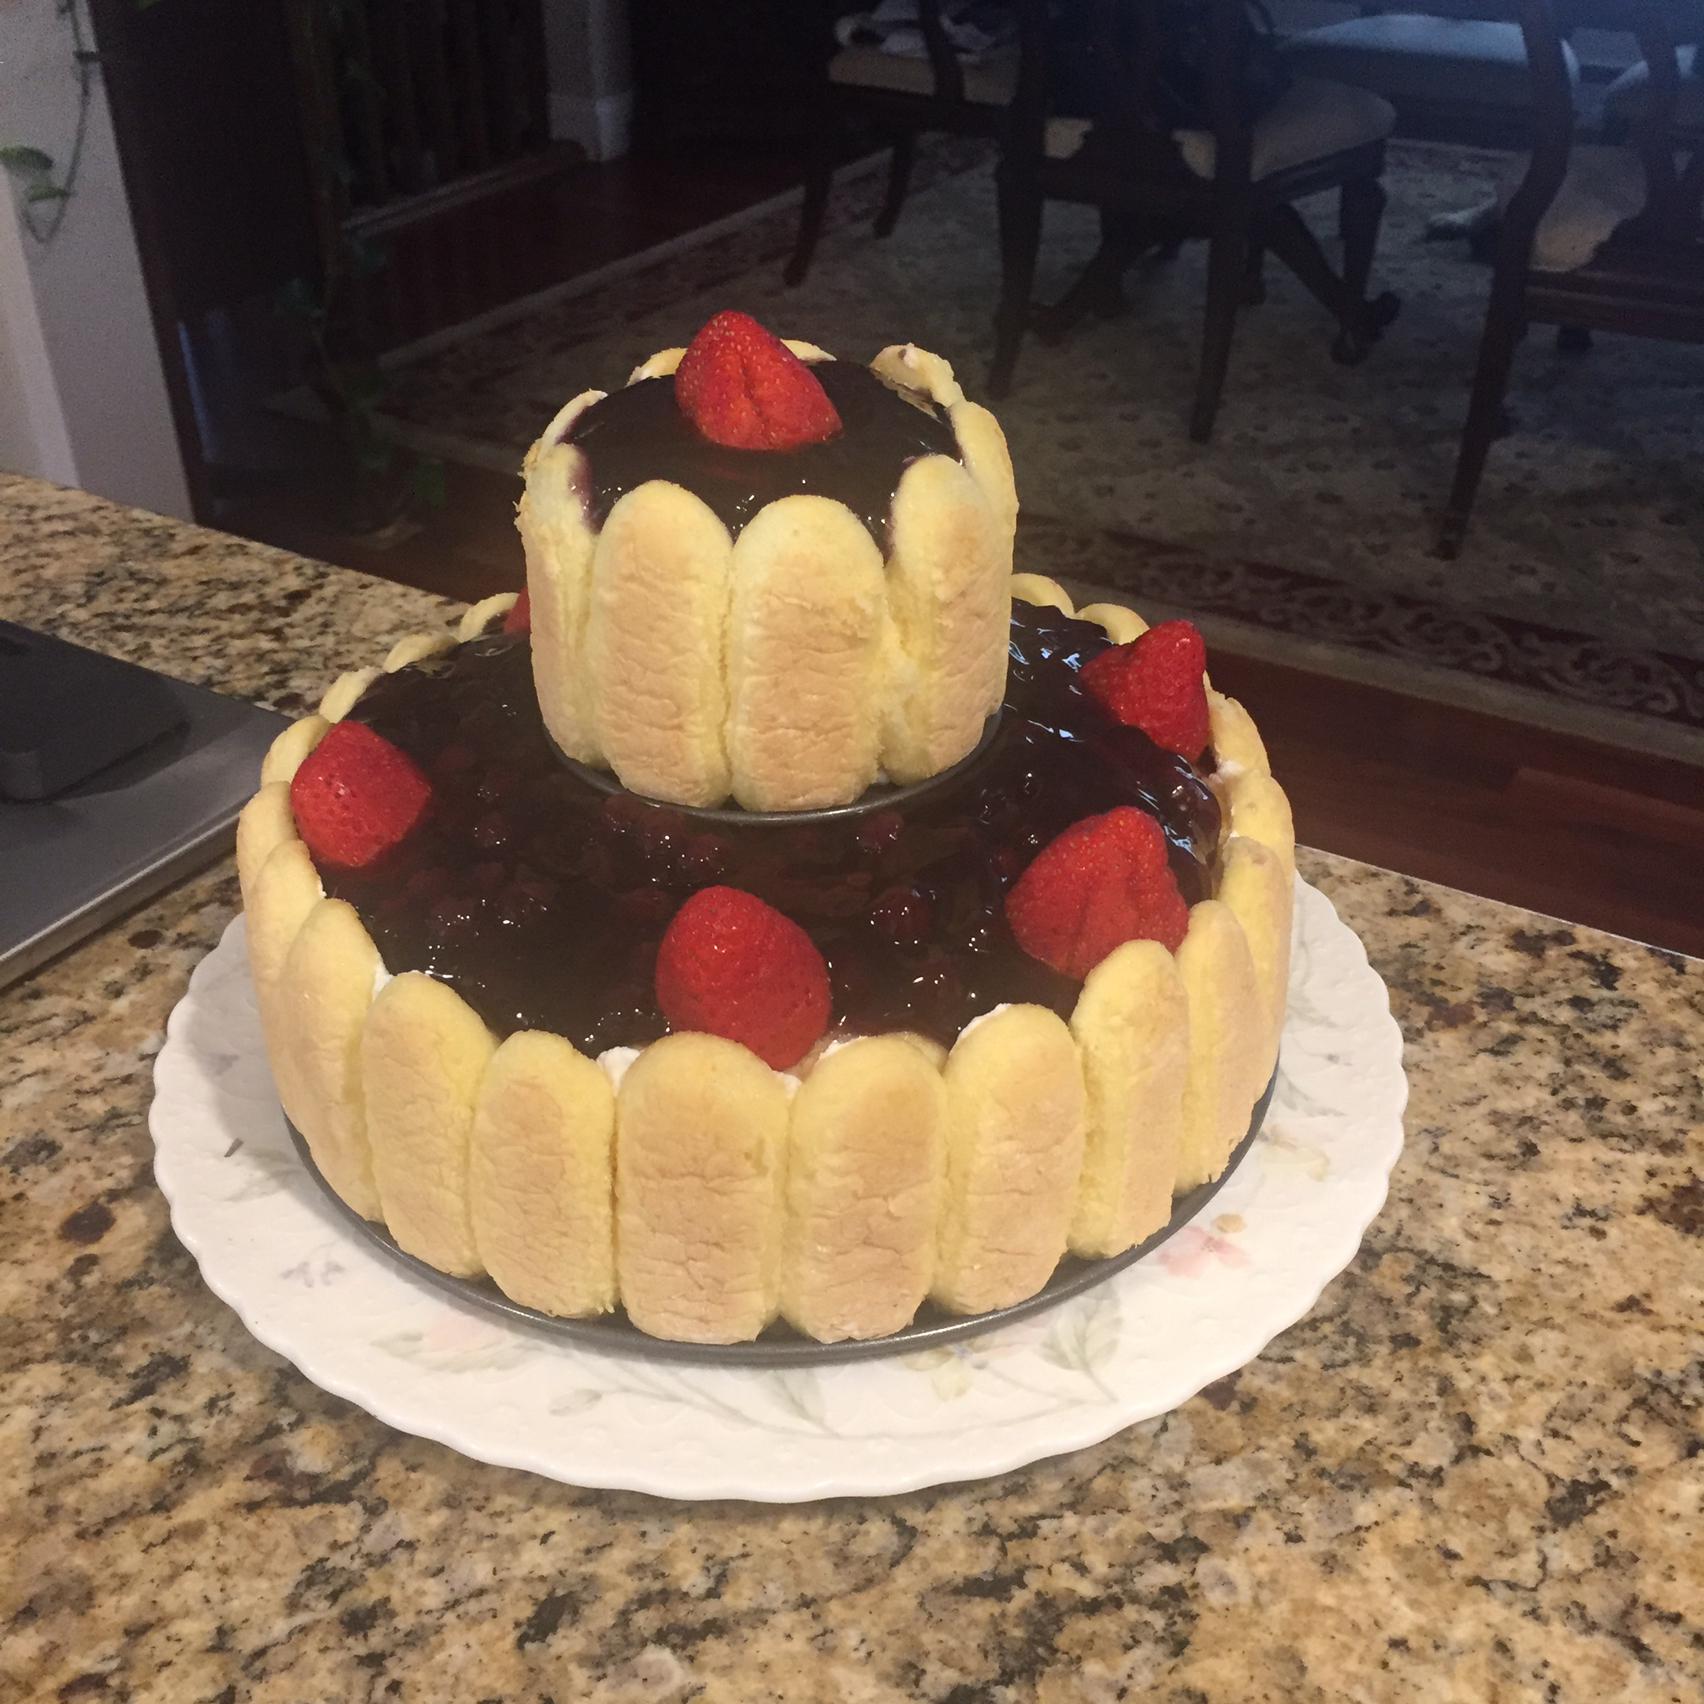 Ladyfinger Cheesecake